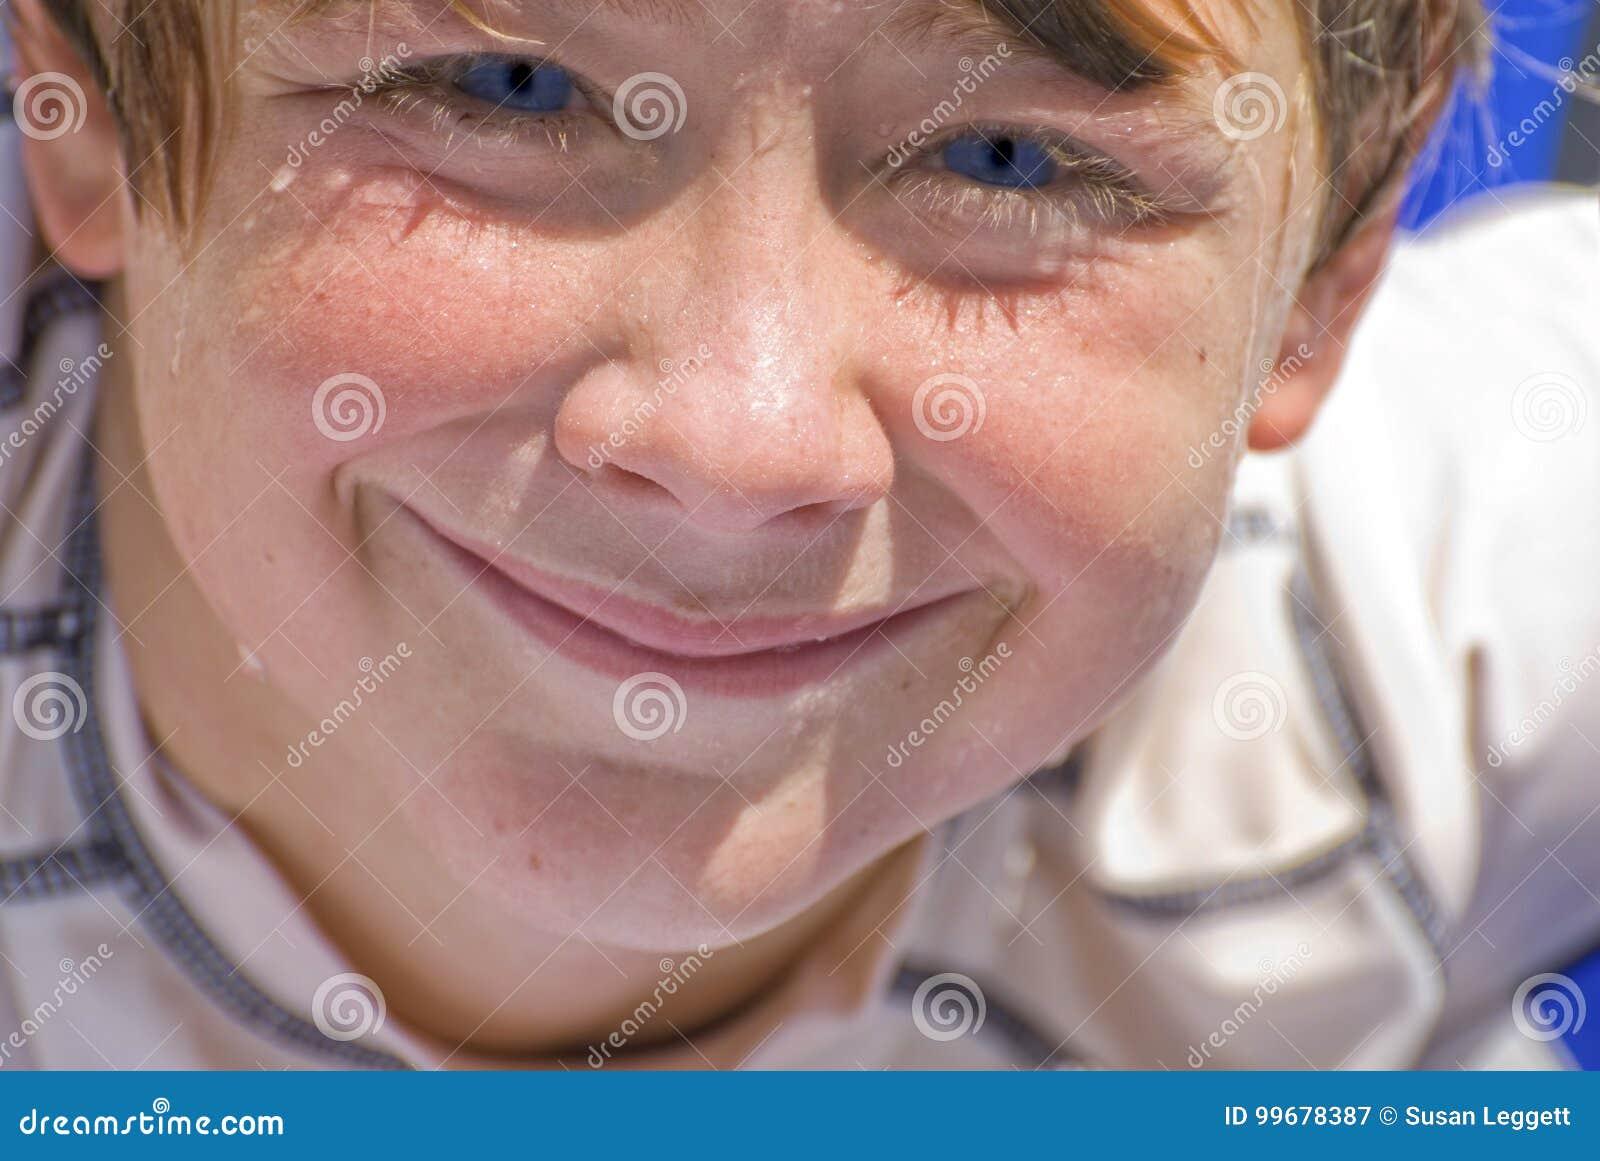 Menino molhado de sorriso da cara